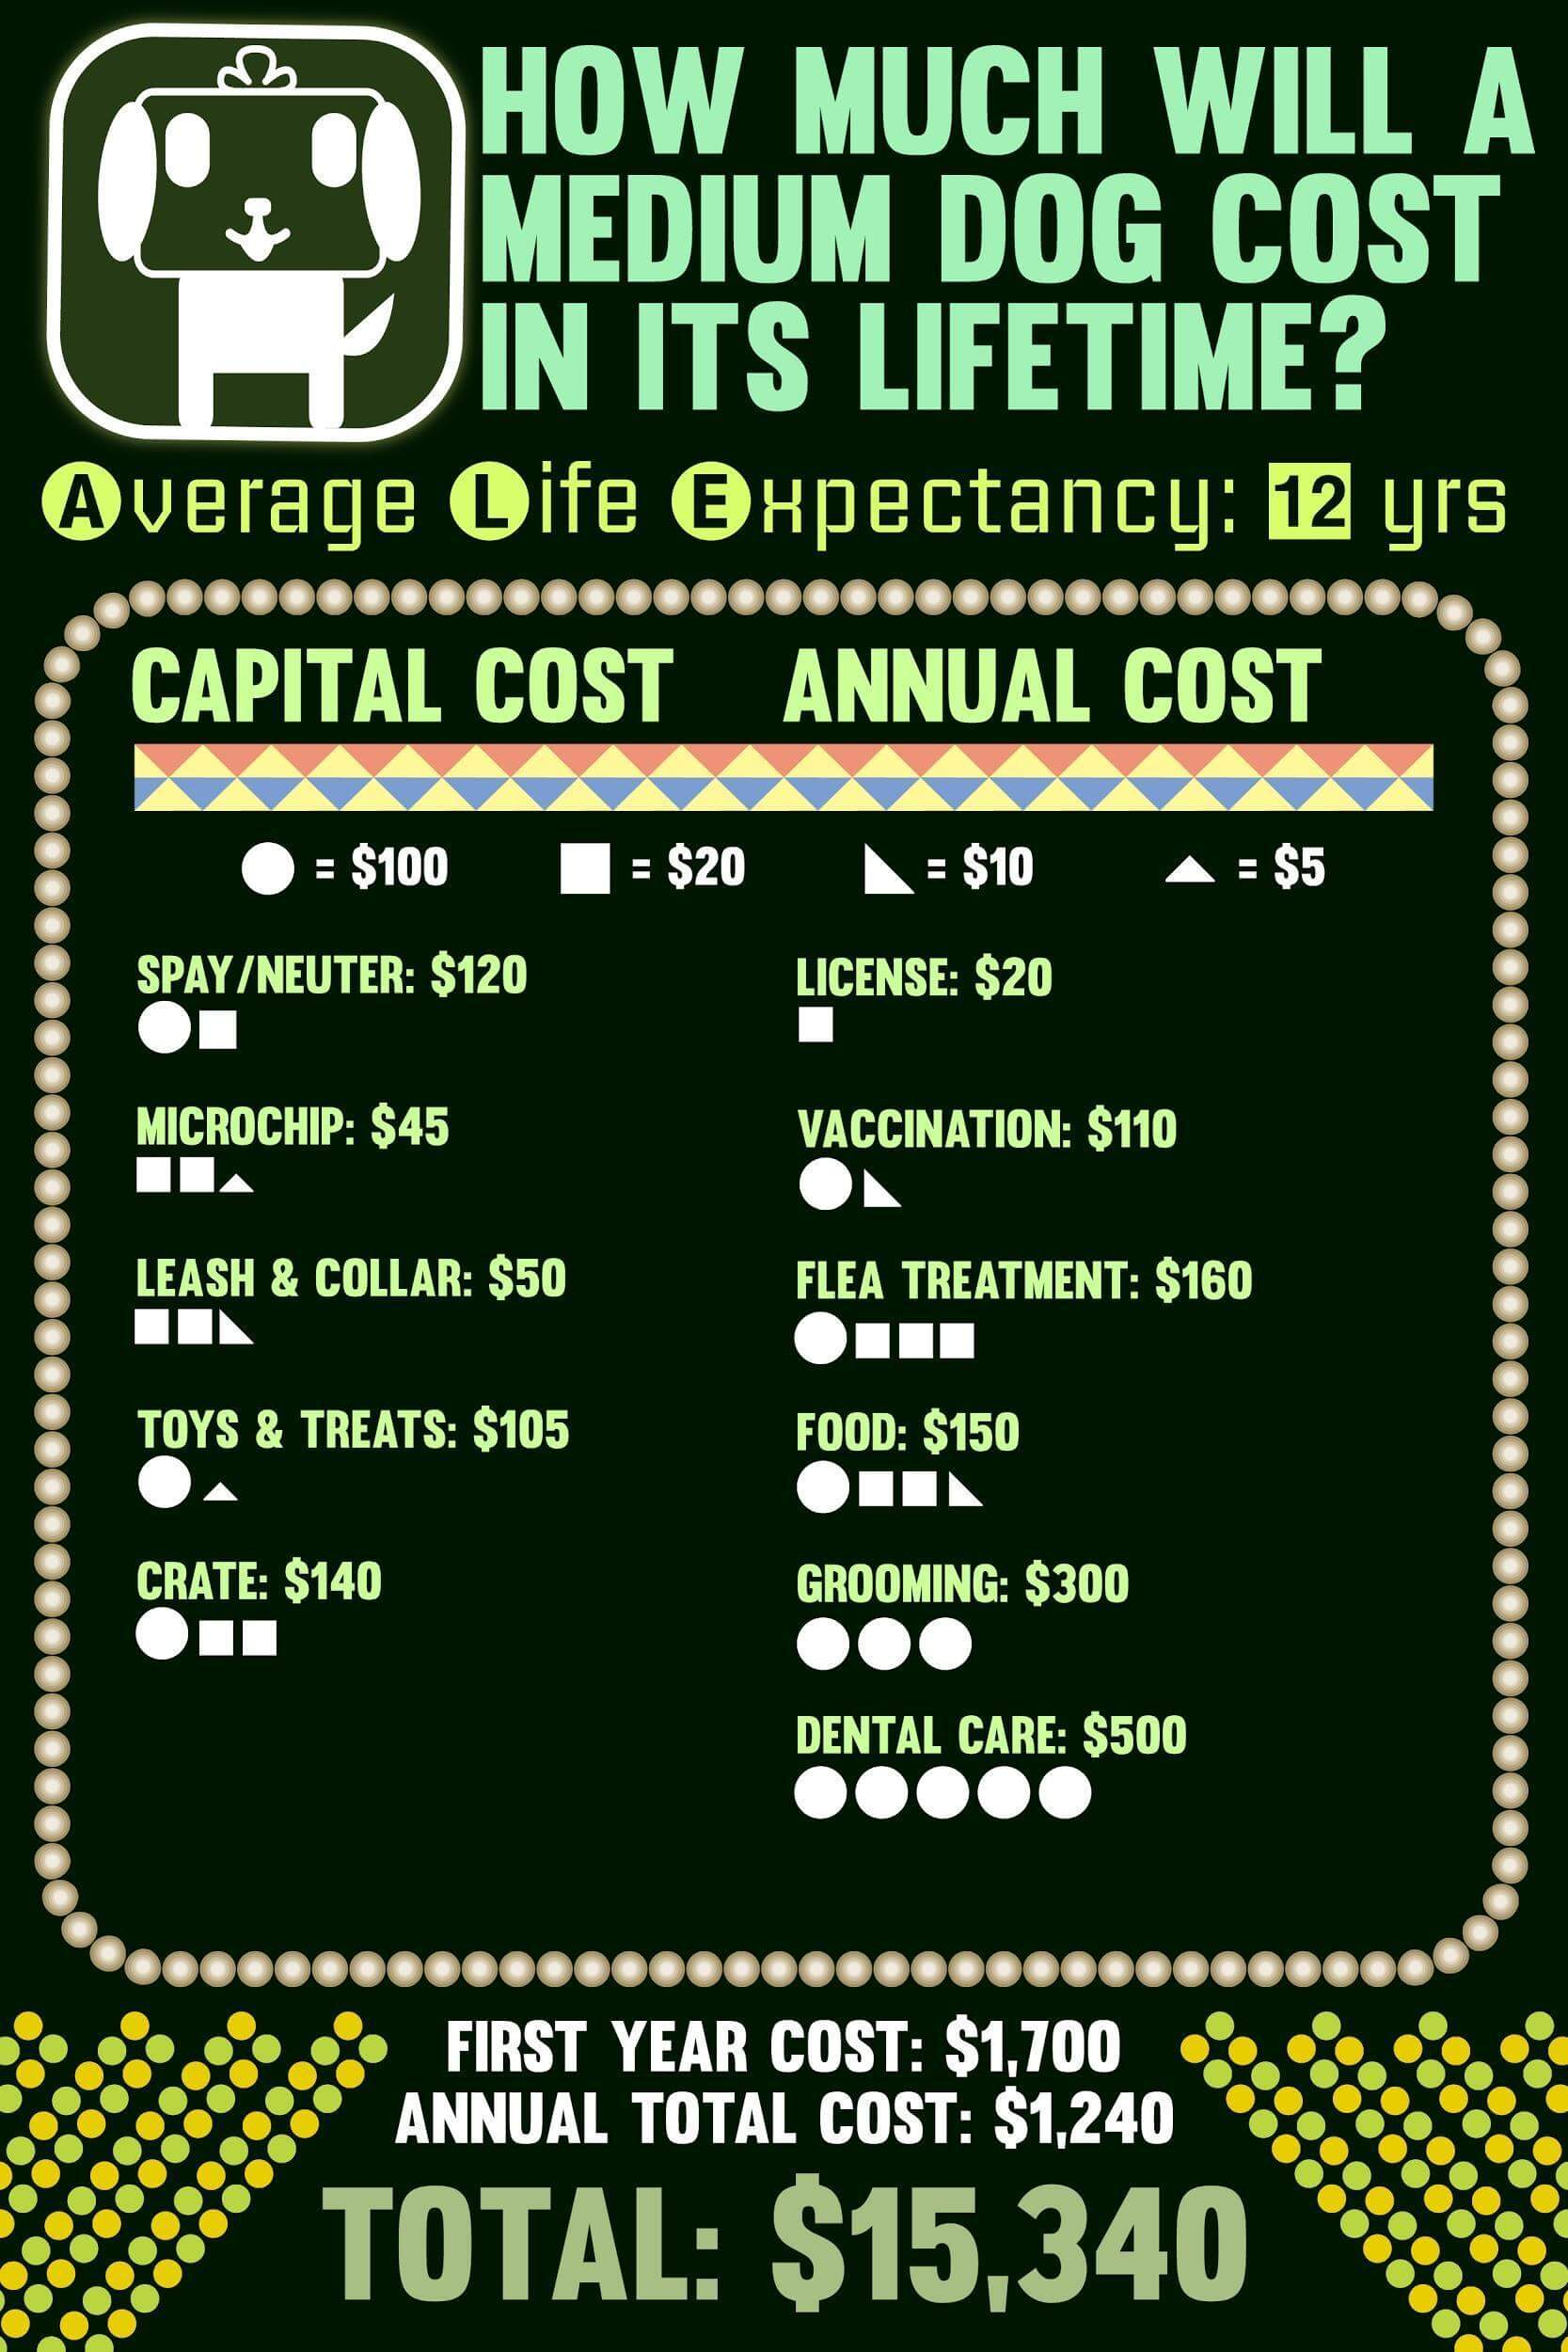 Lifetime cost of medium dogs